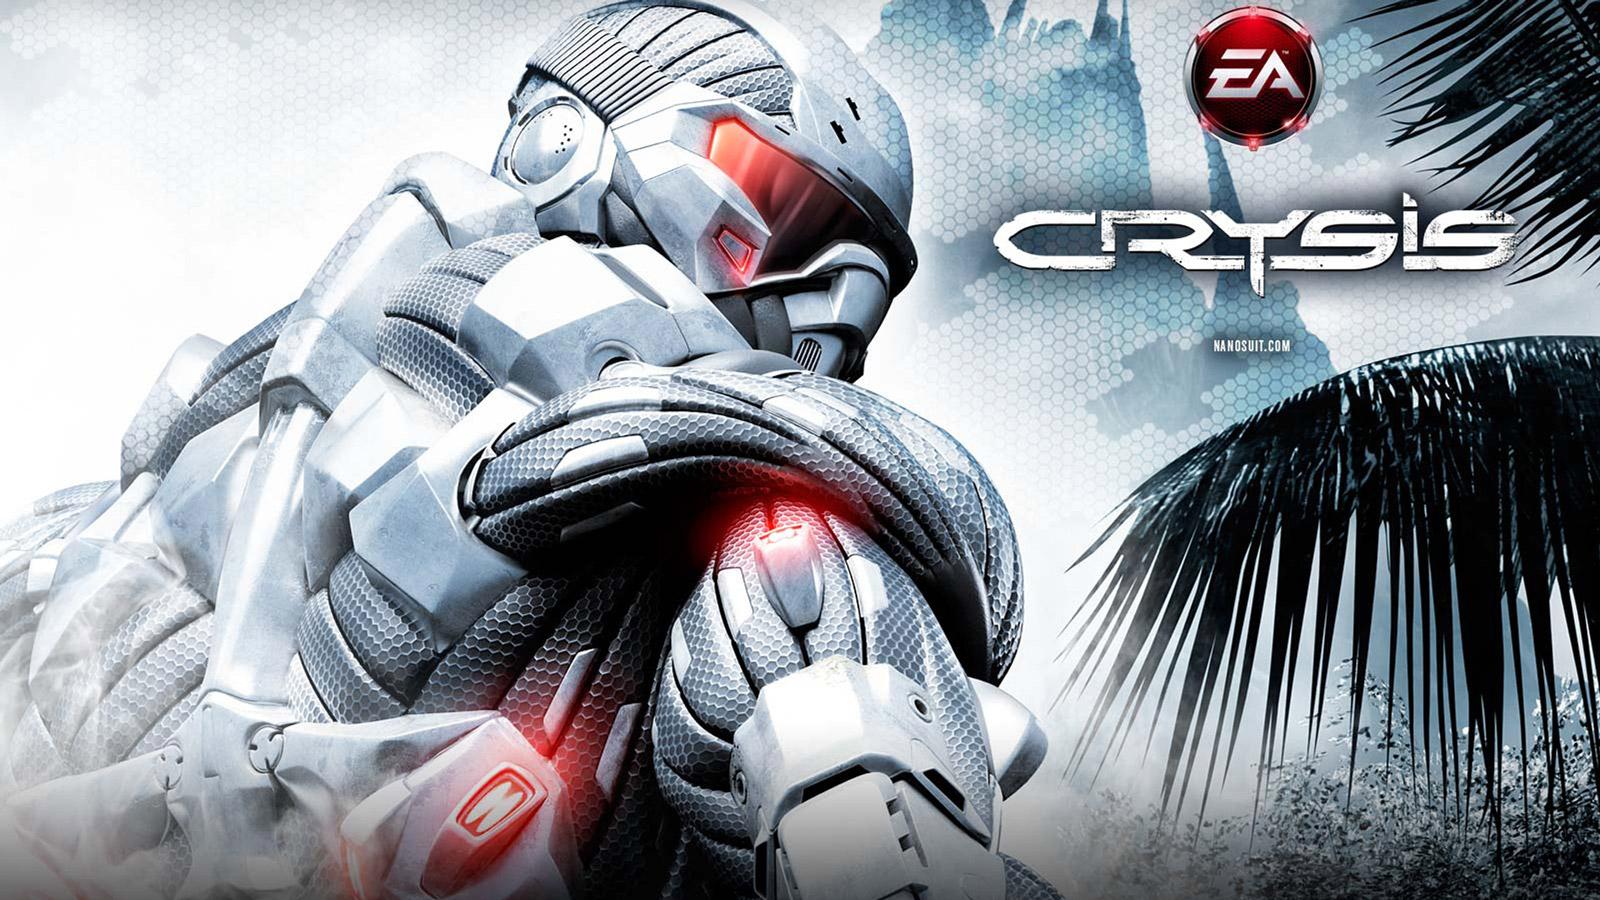 Free Crysis Wallpaper in 1600x900